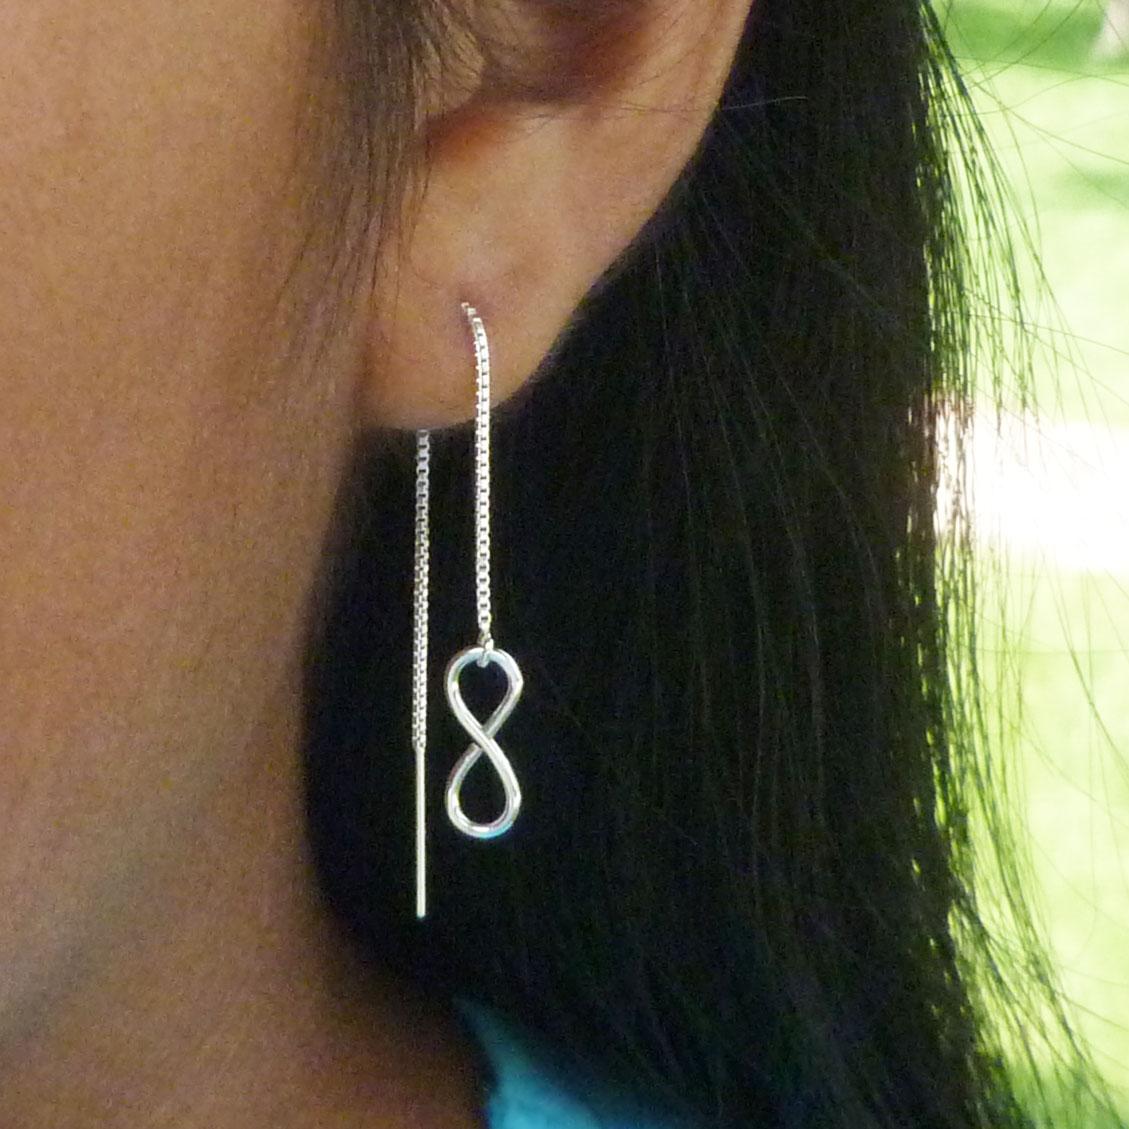 sterling silver Infinity threader earrings